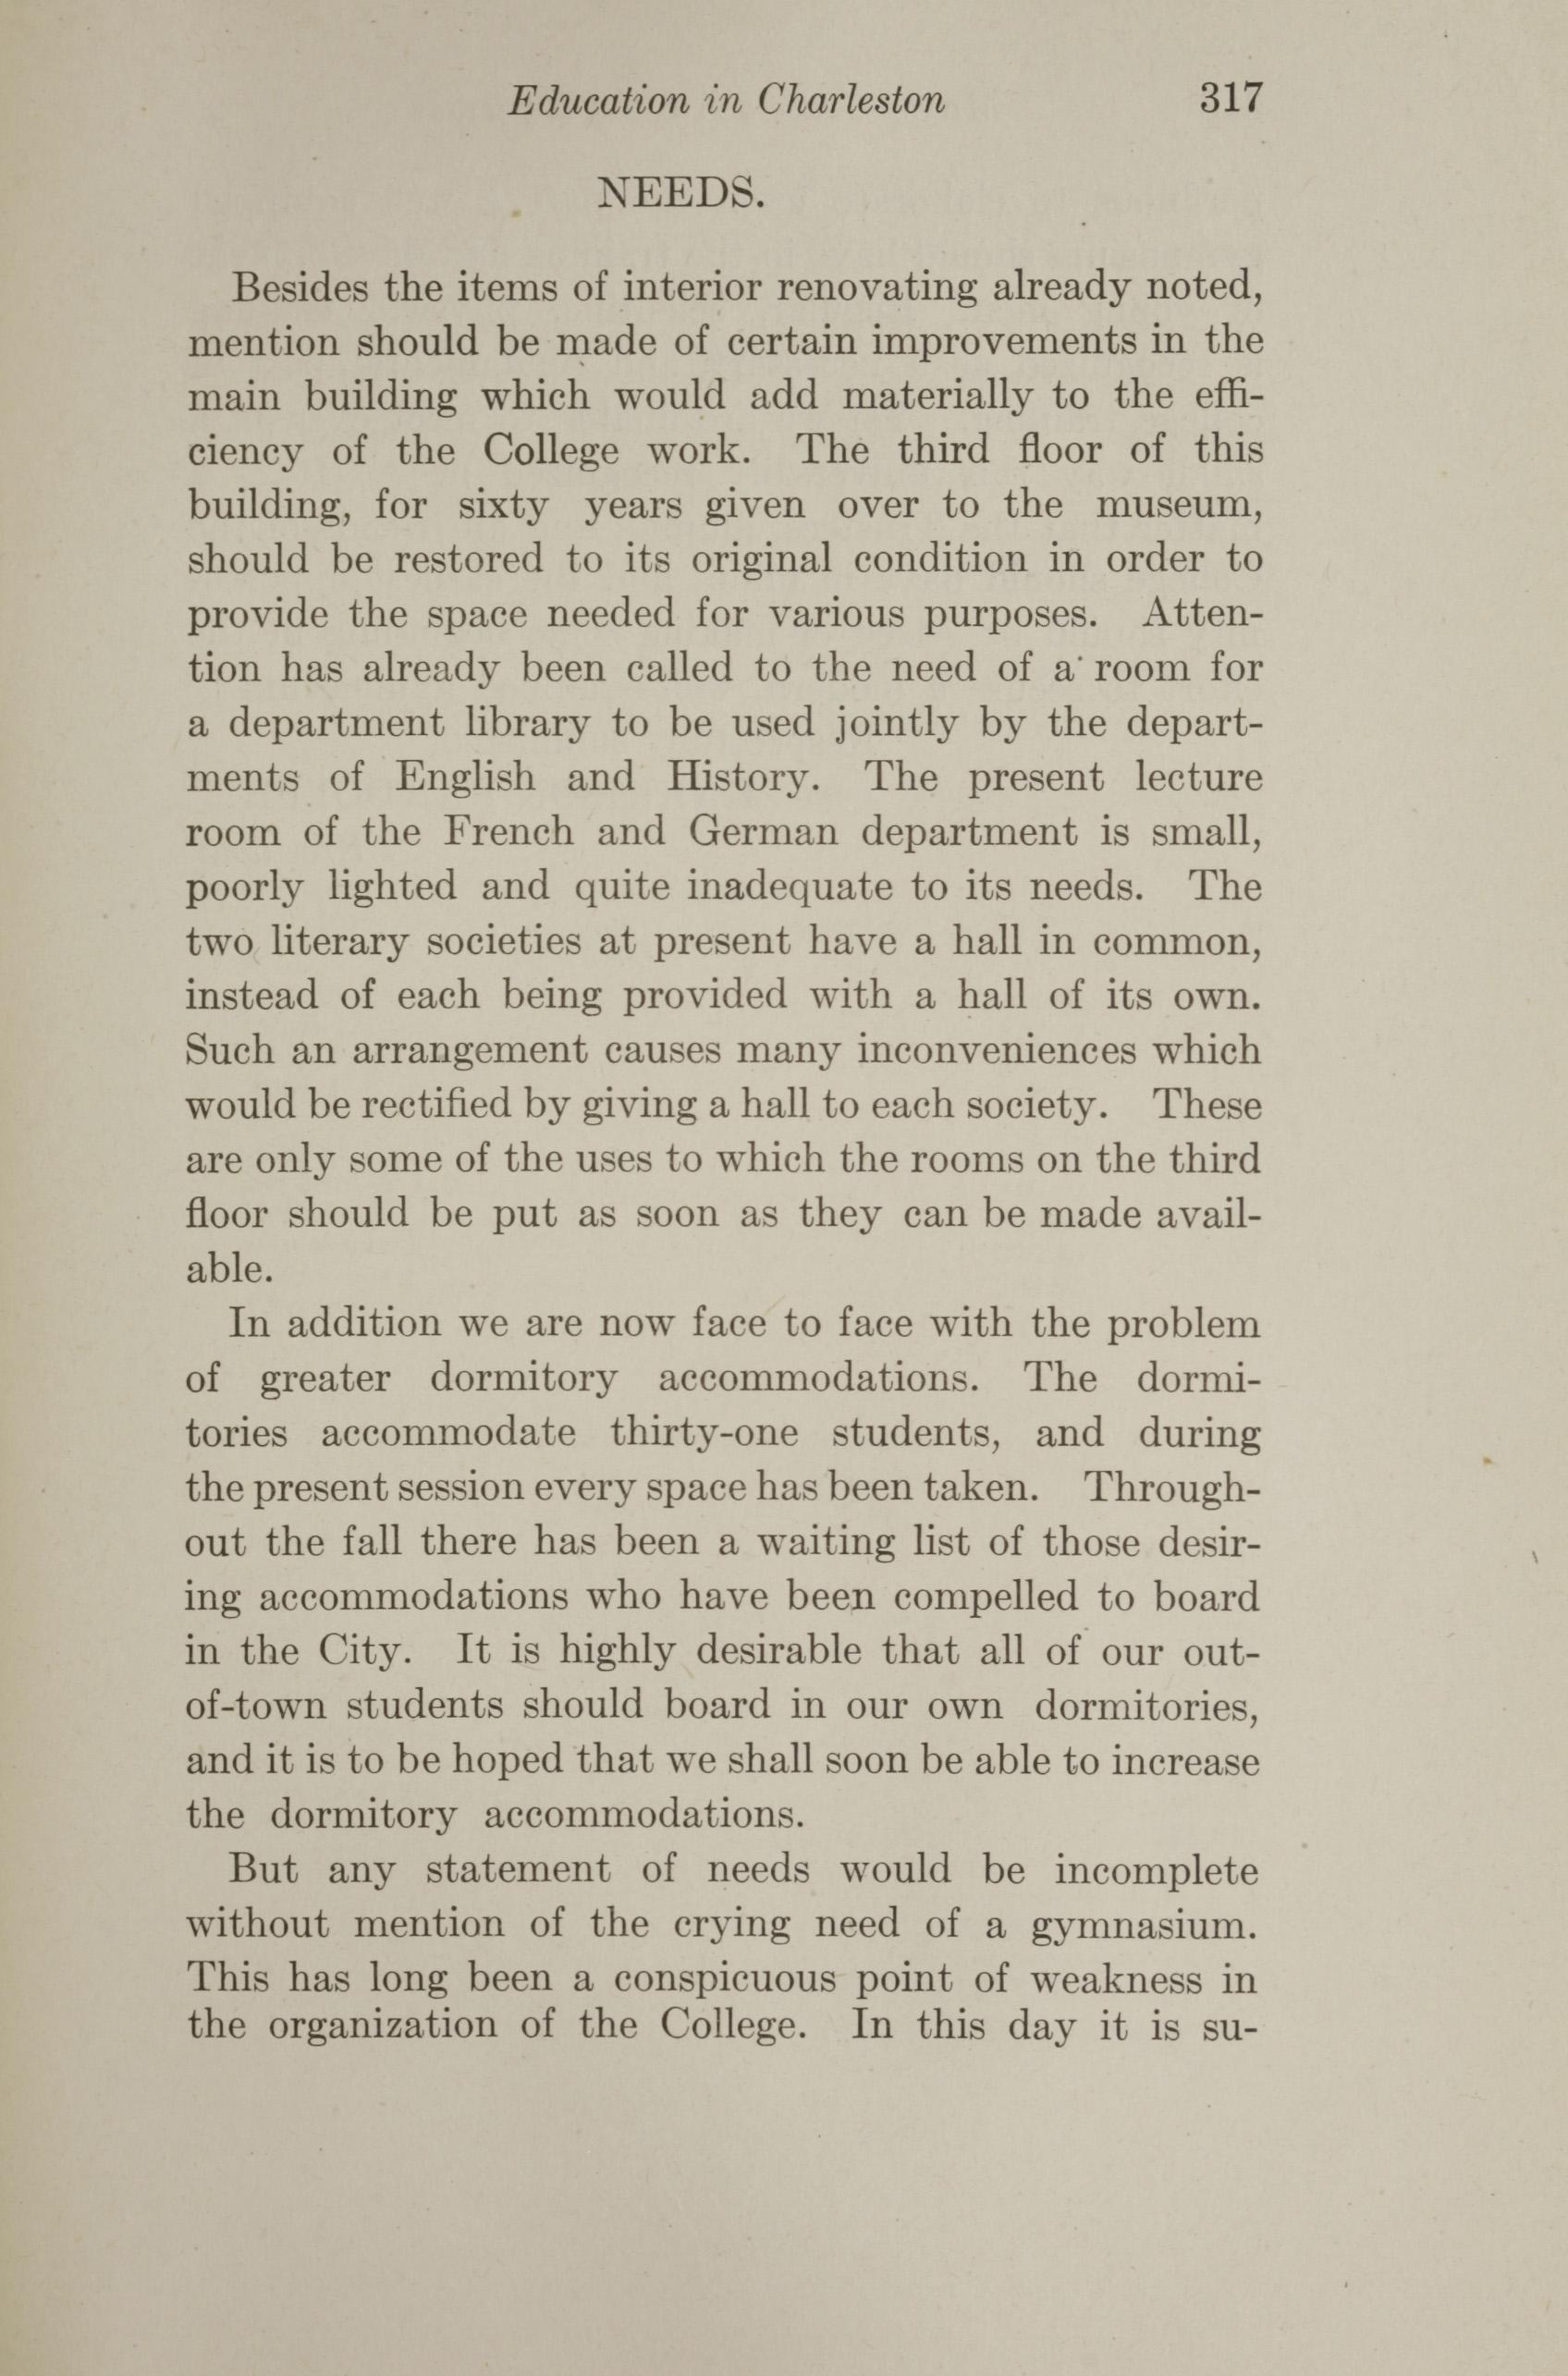 Charleston Yearbook, 1912, page 317